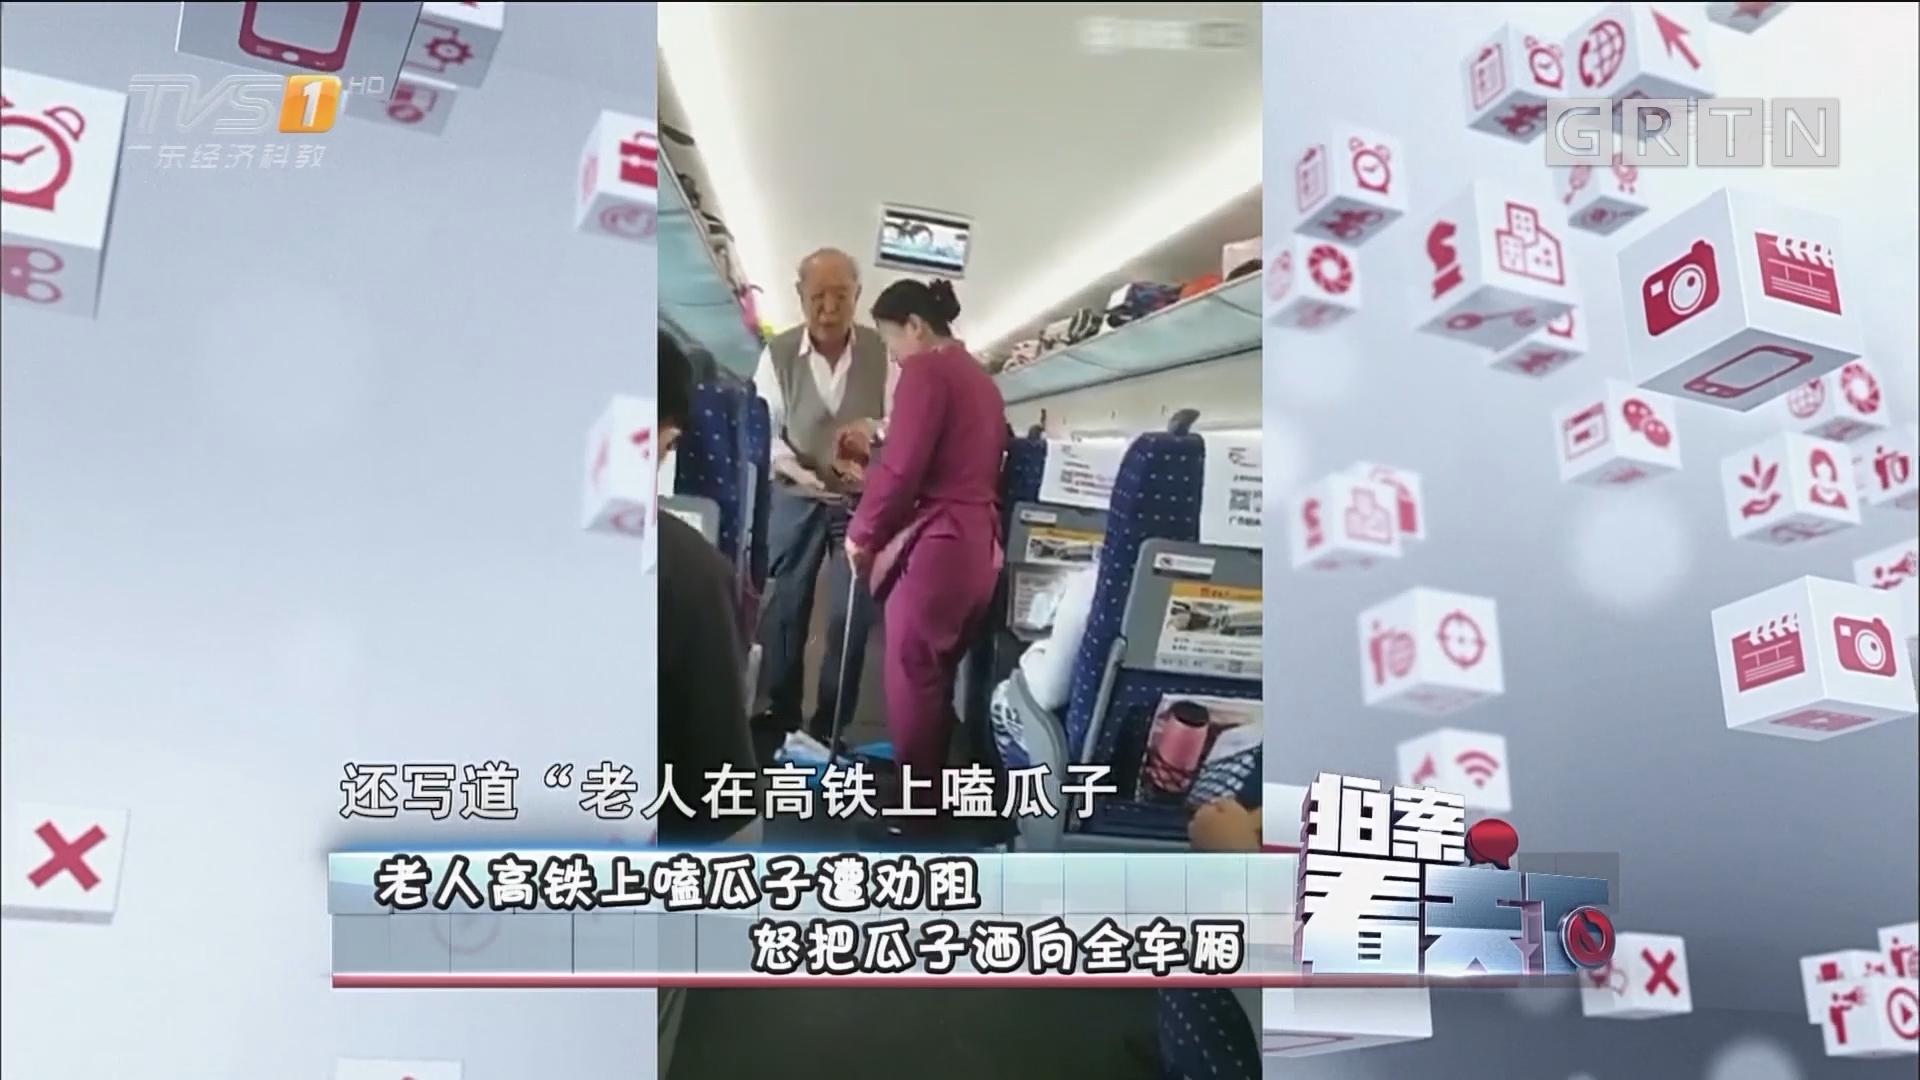 [HD][2017-05-23]拍案看天下:老人高铁上嗑瓜子遭劝阻 怒把瓜子洒向全车厢